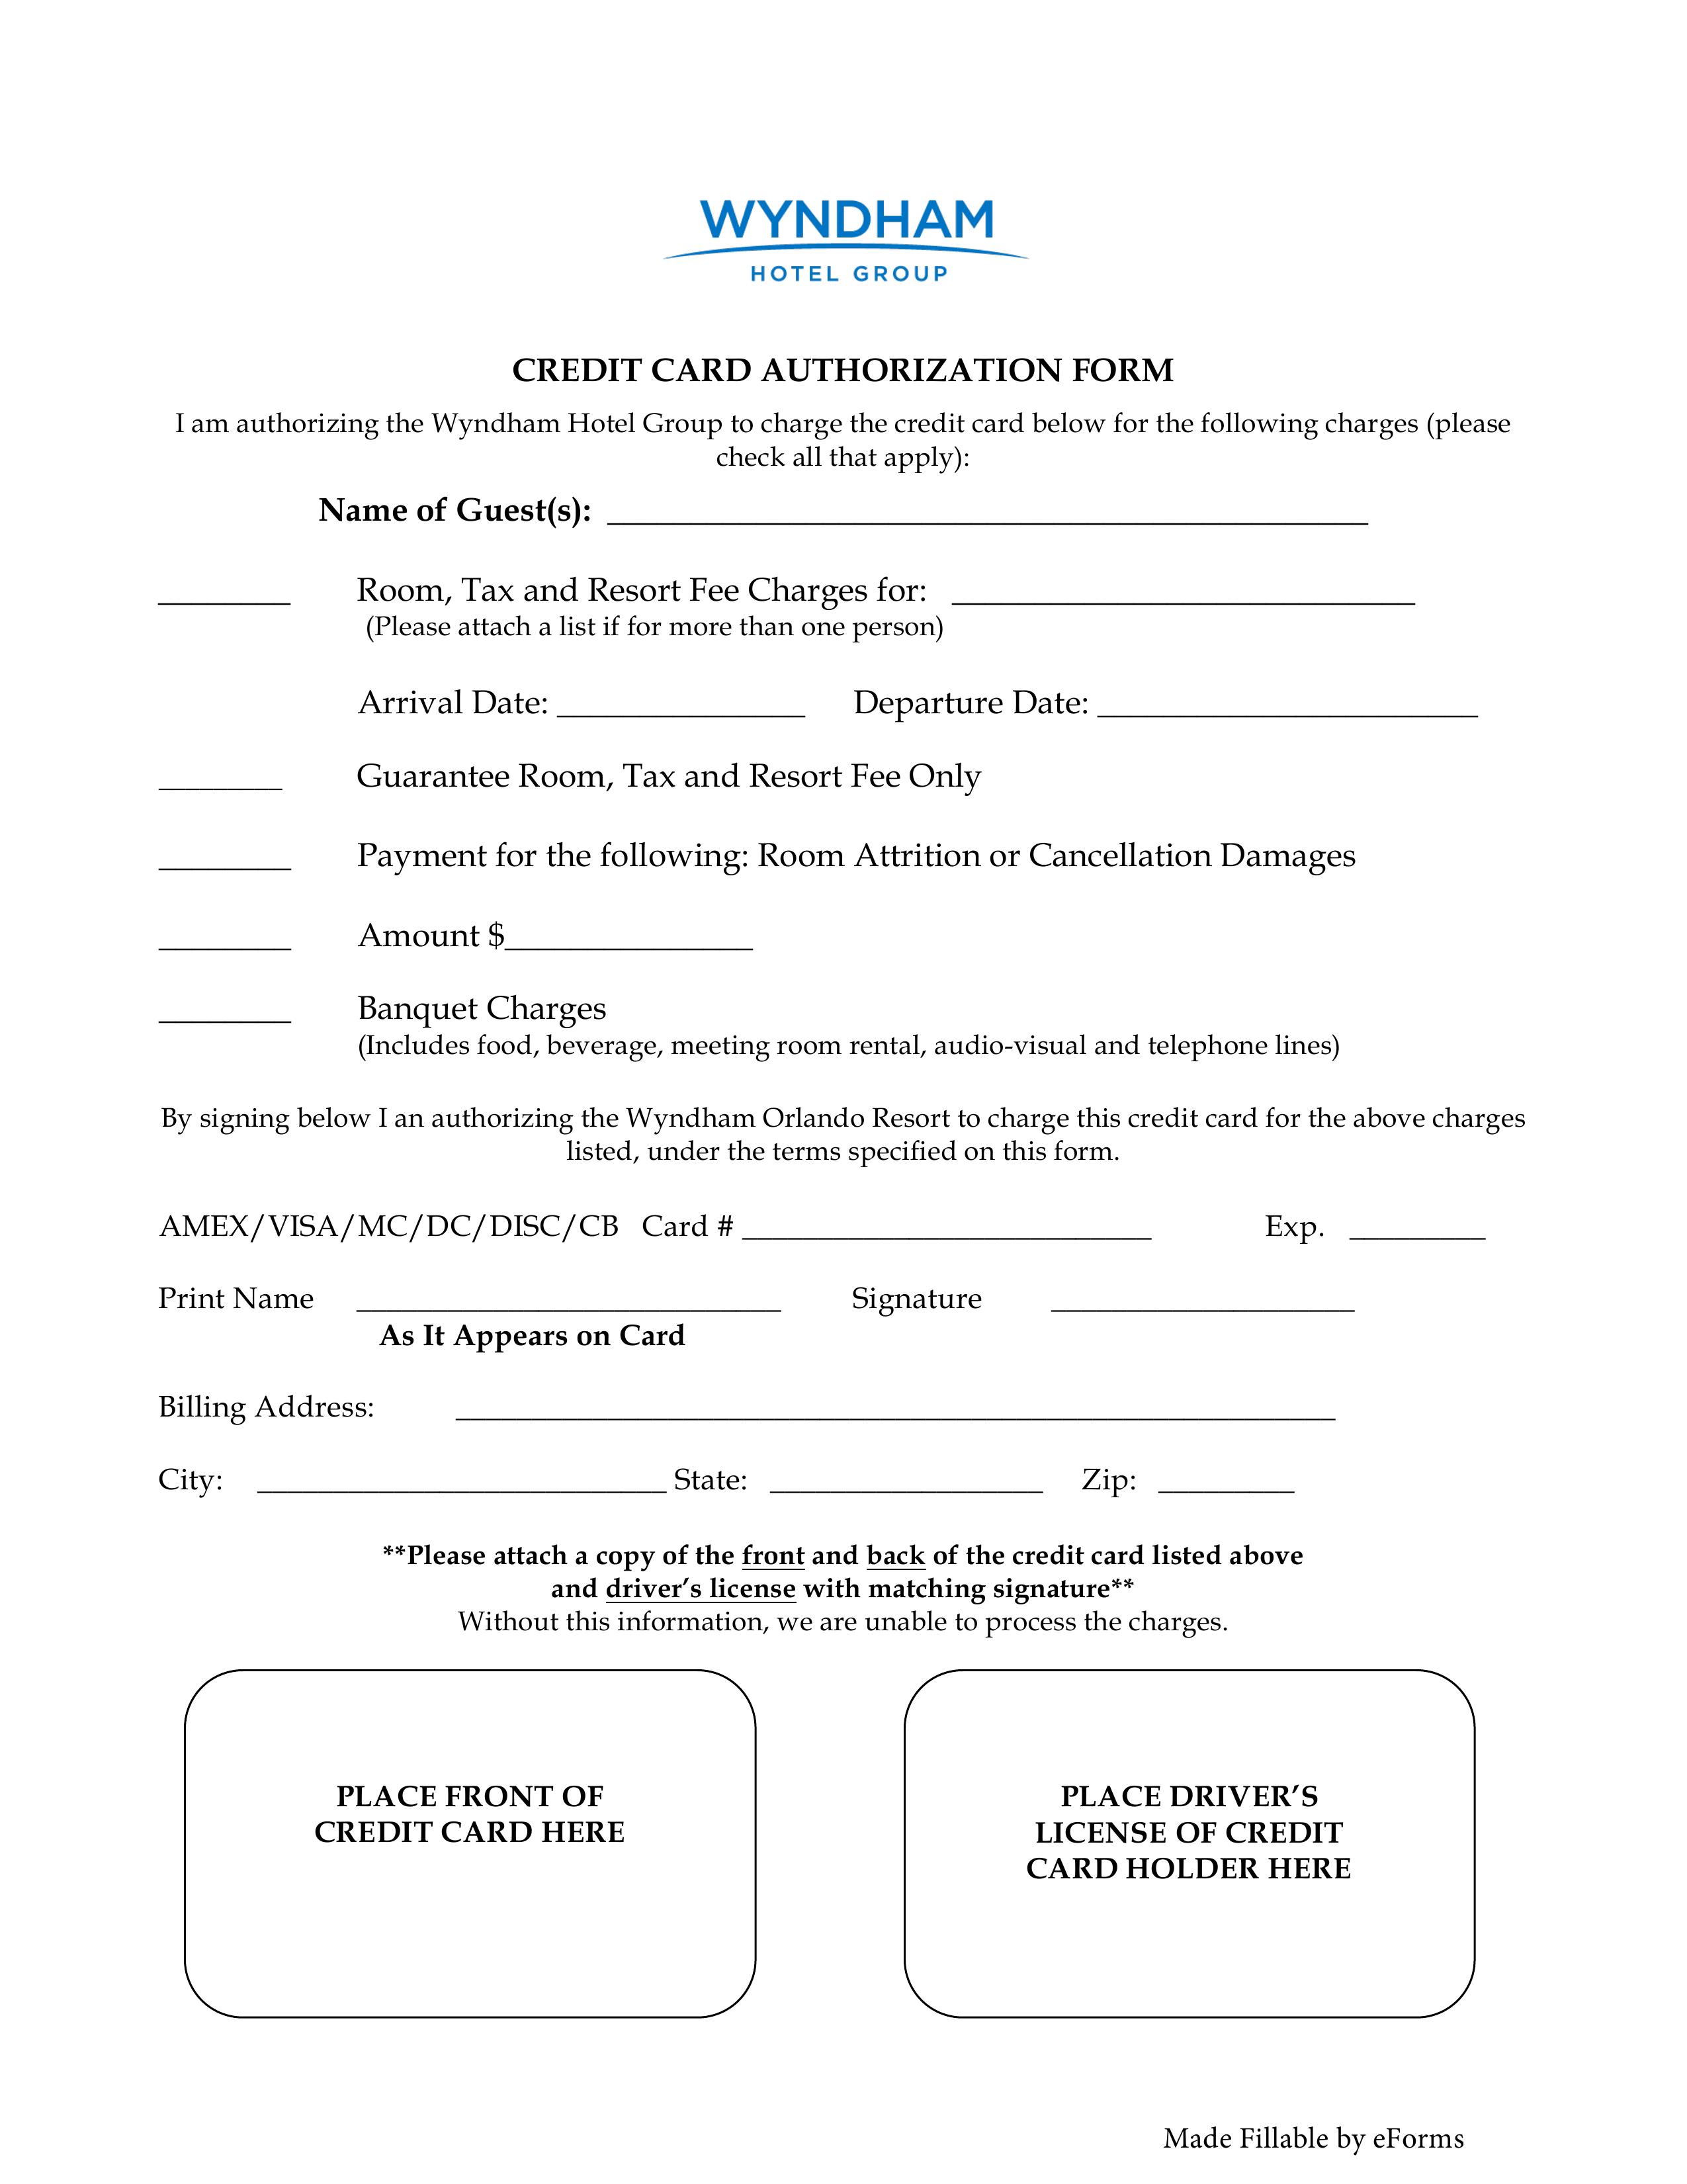 Free Wyndham Hotels Credit Card Authorization Form Word